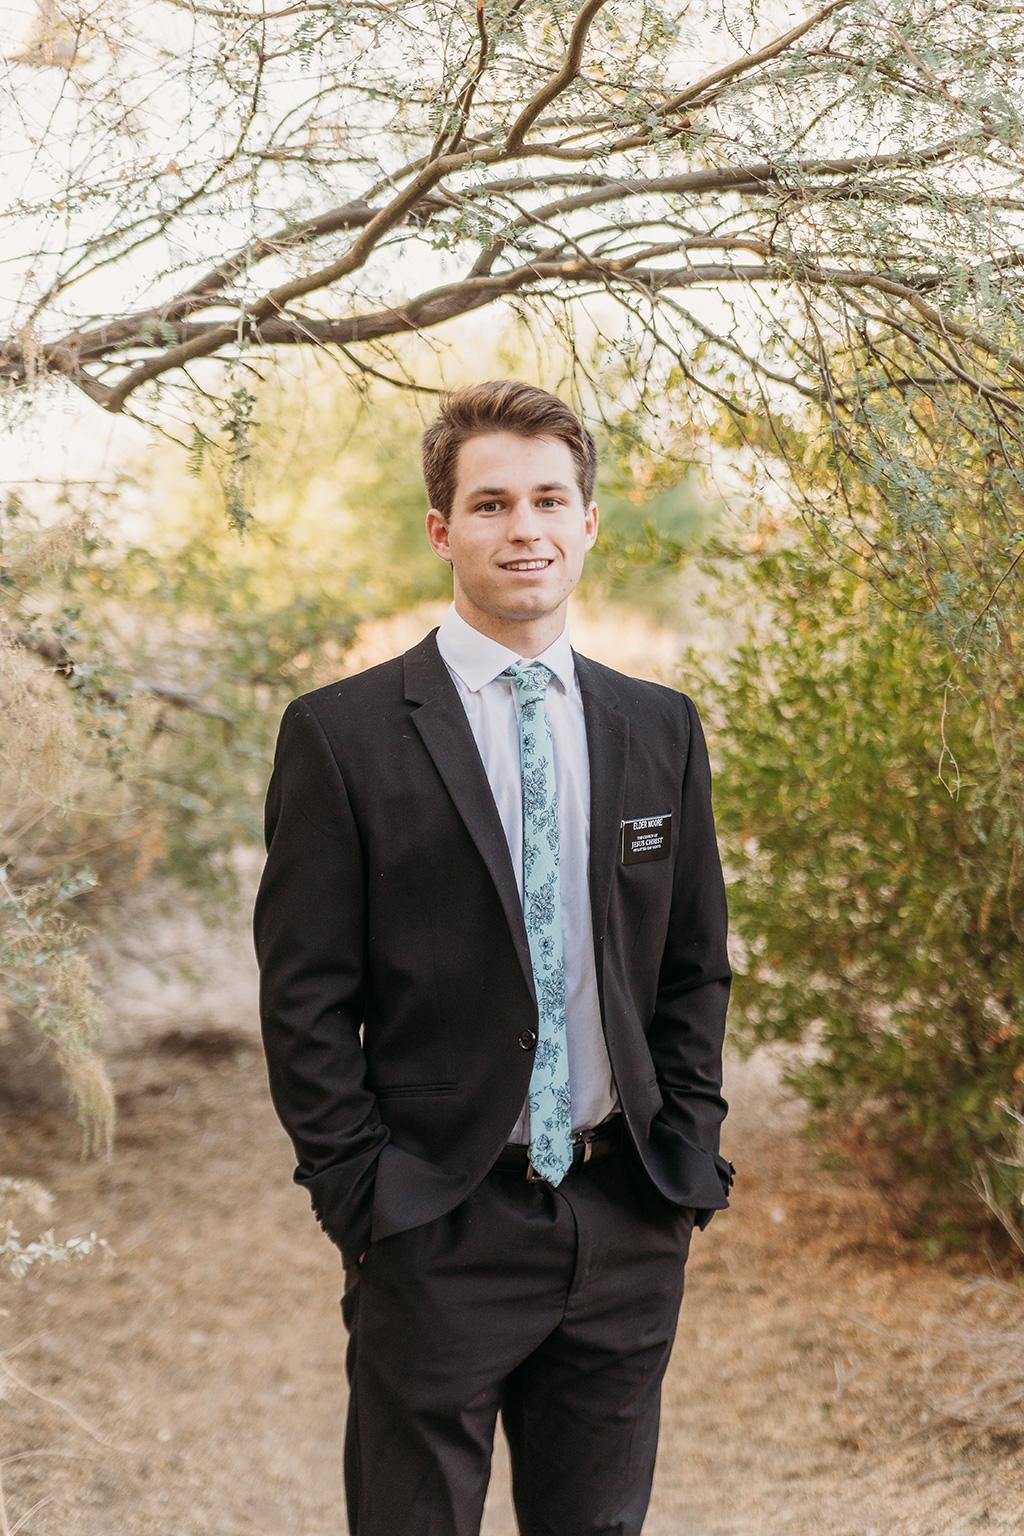 LDS missionary photoshoot in chandler arizona